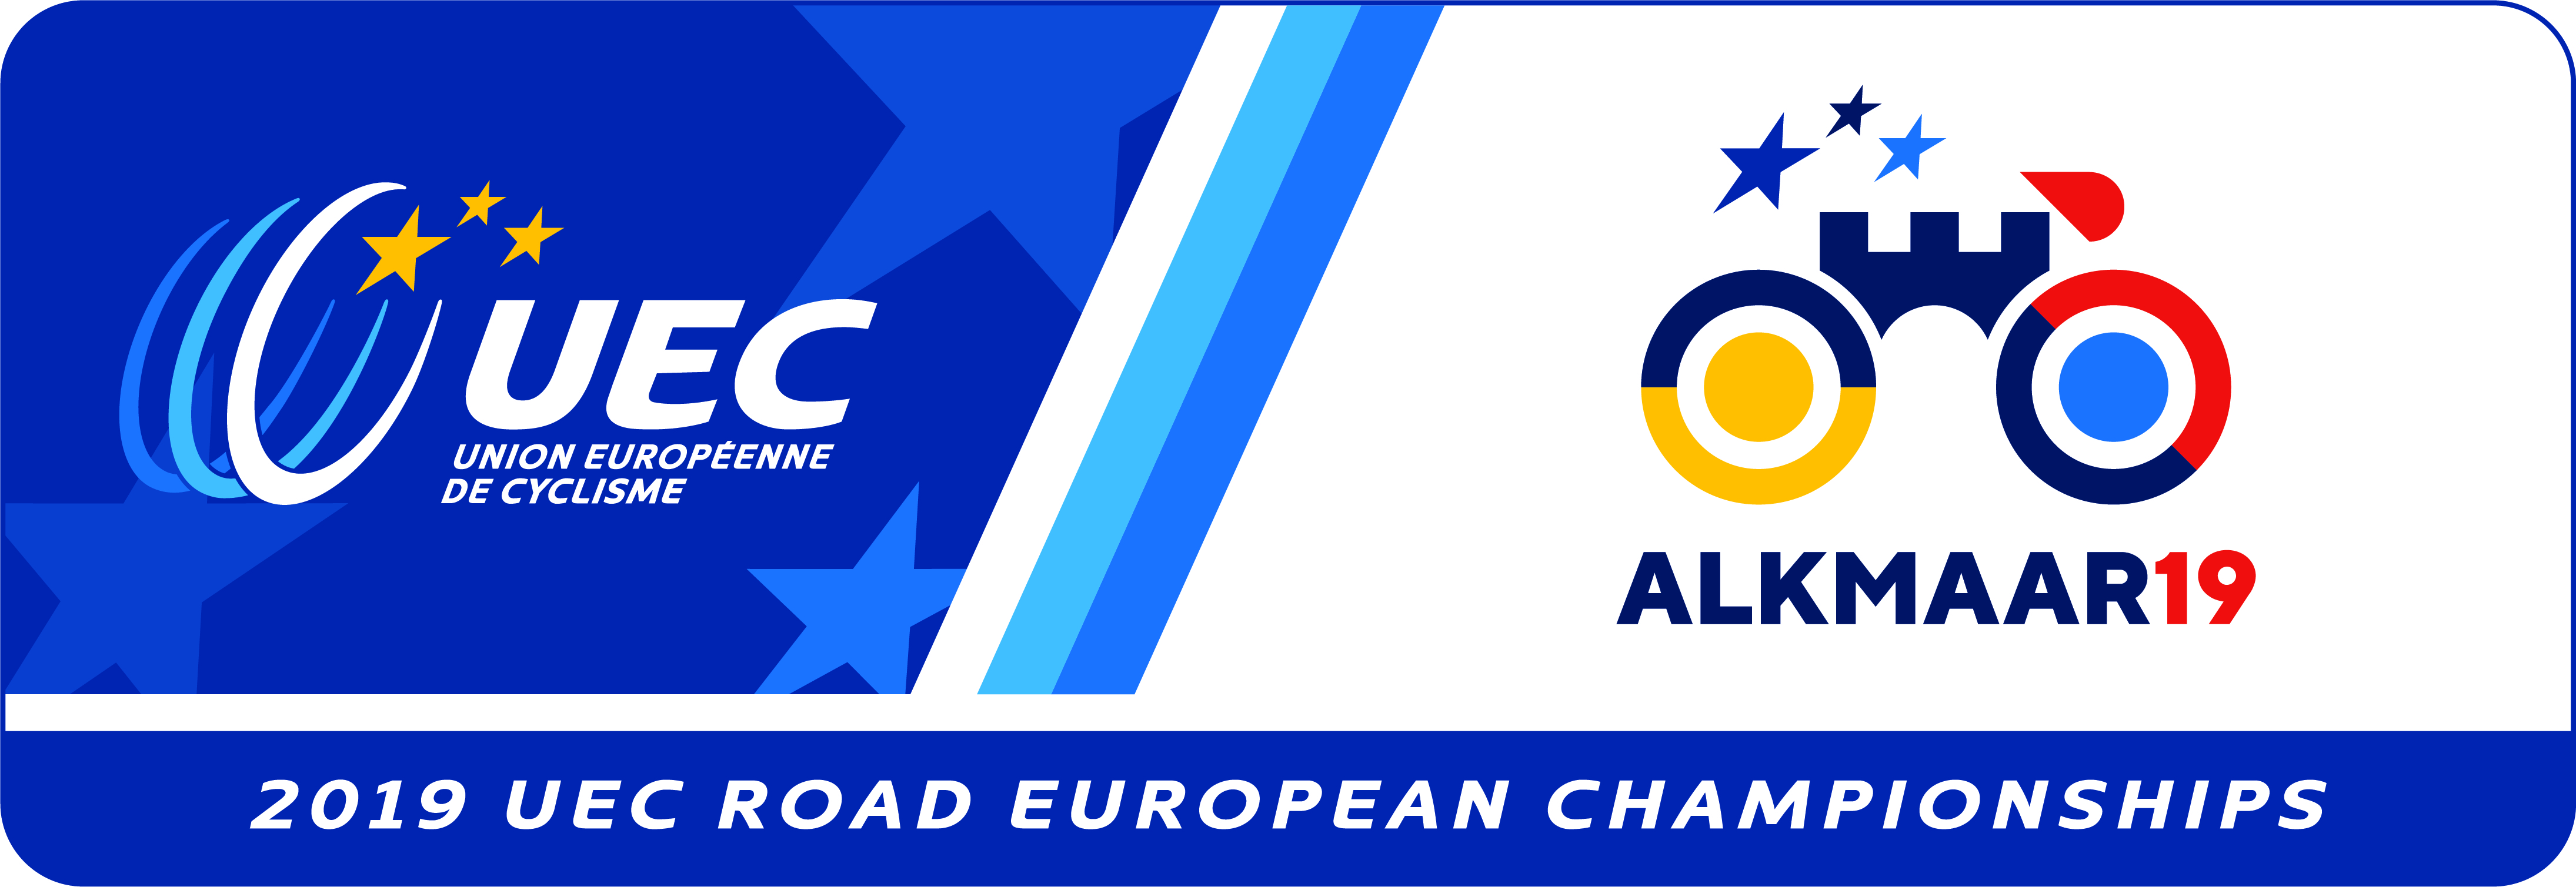 Championnats d'Europe UEC-ALKMAAR19-EVENT-BOX-LOGO-CMYK